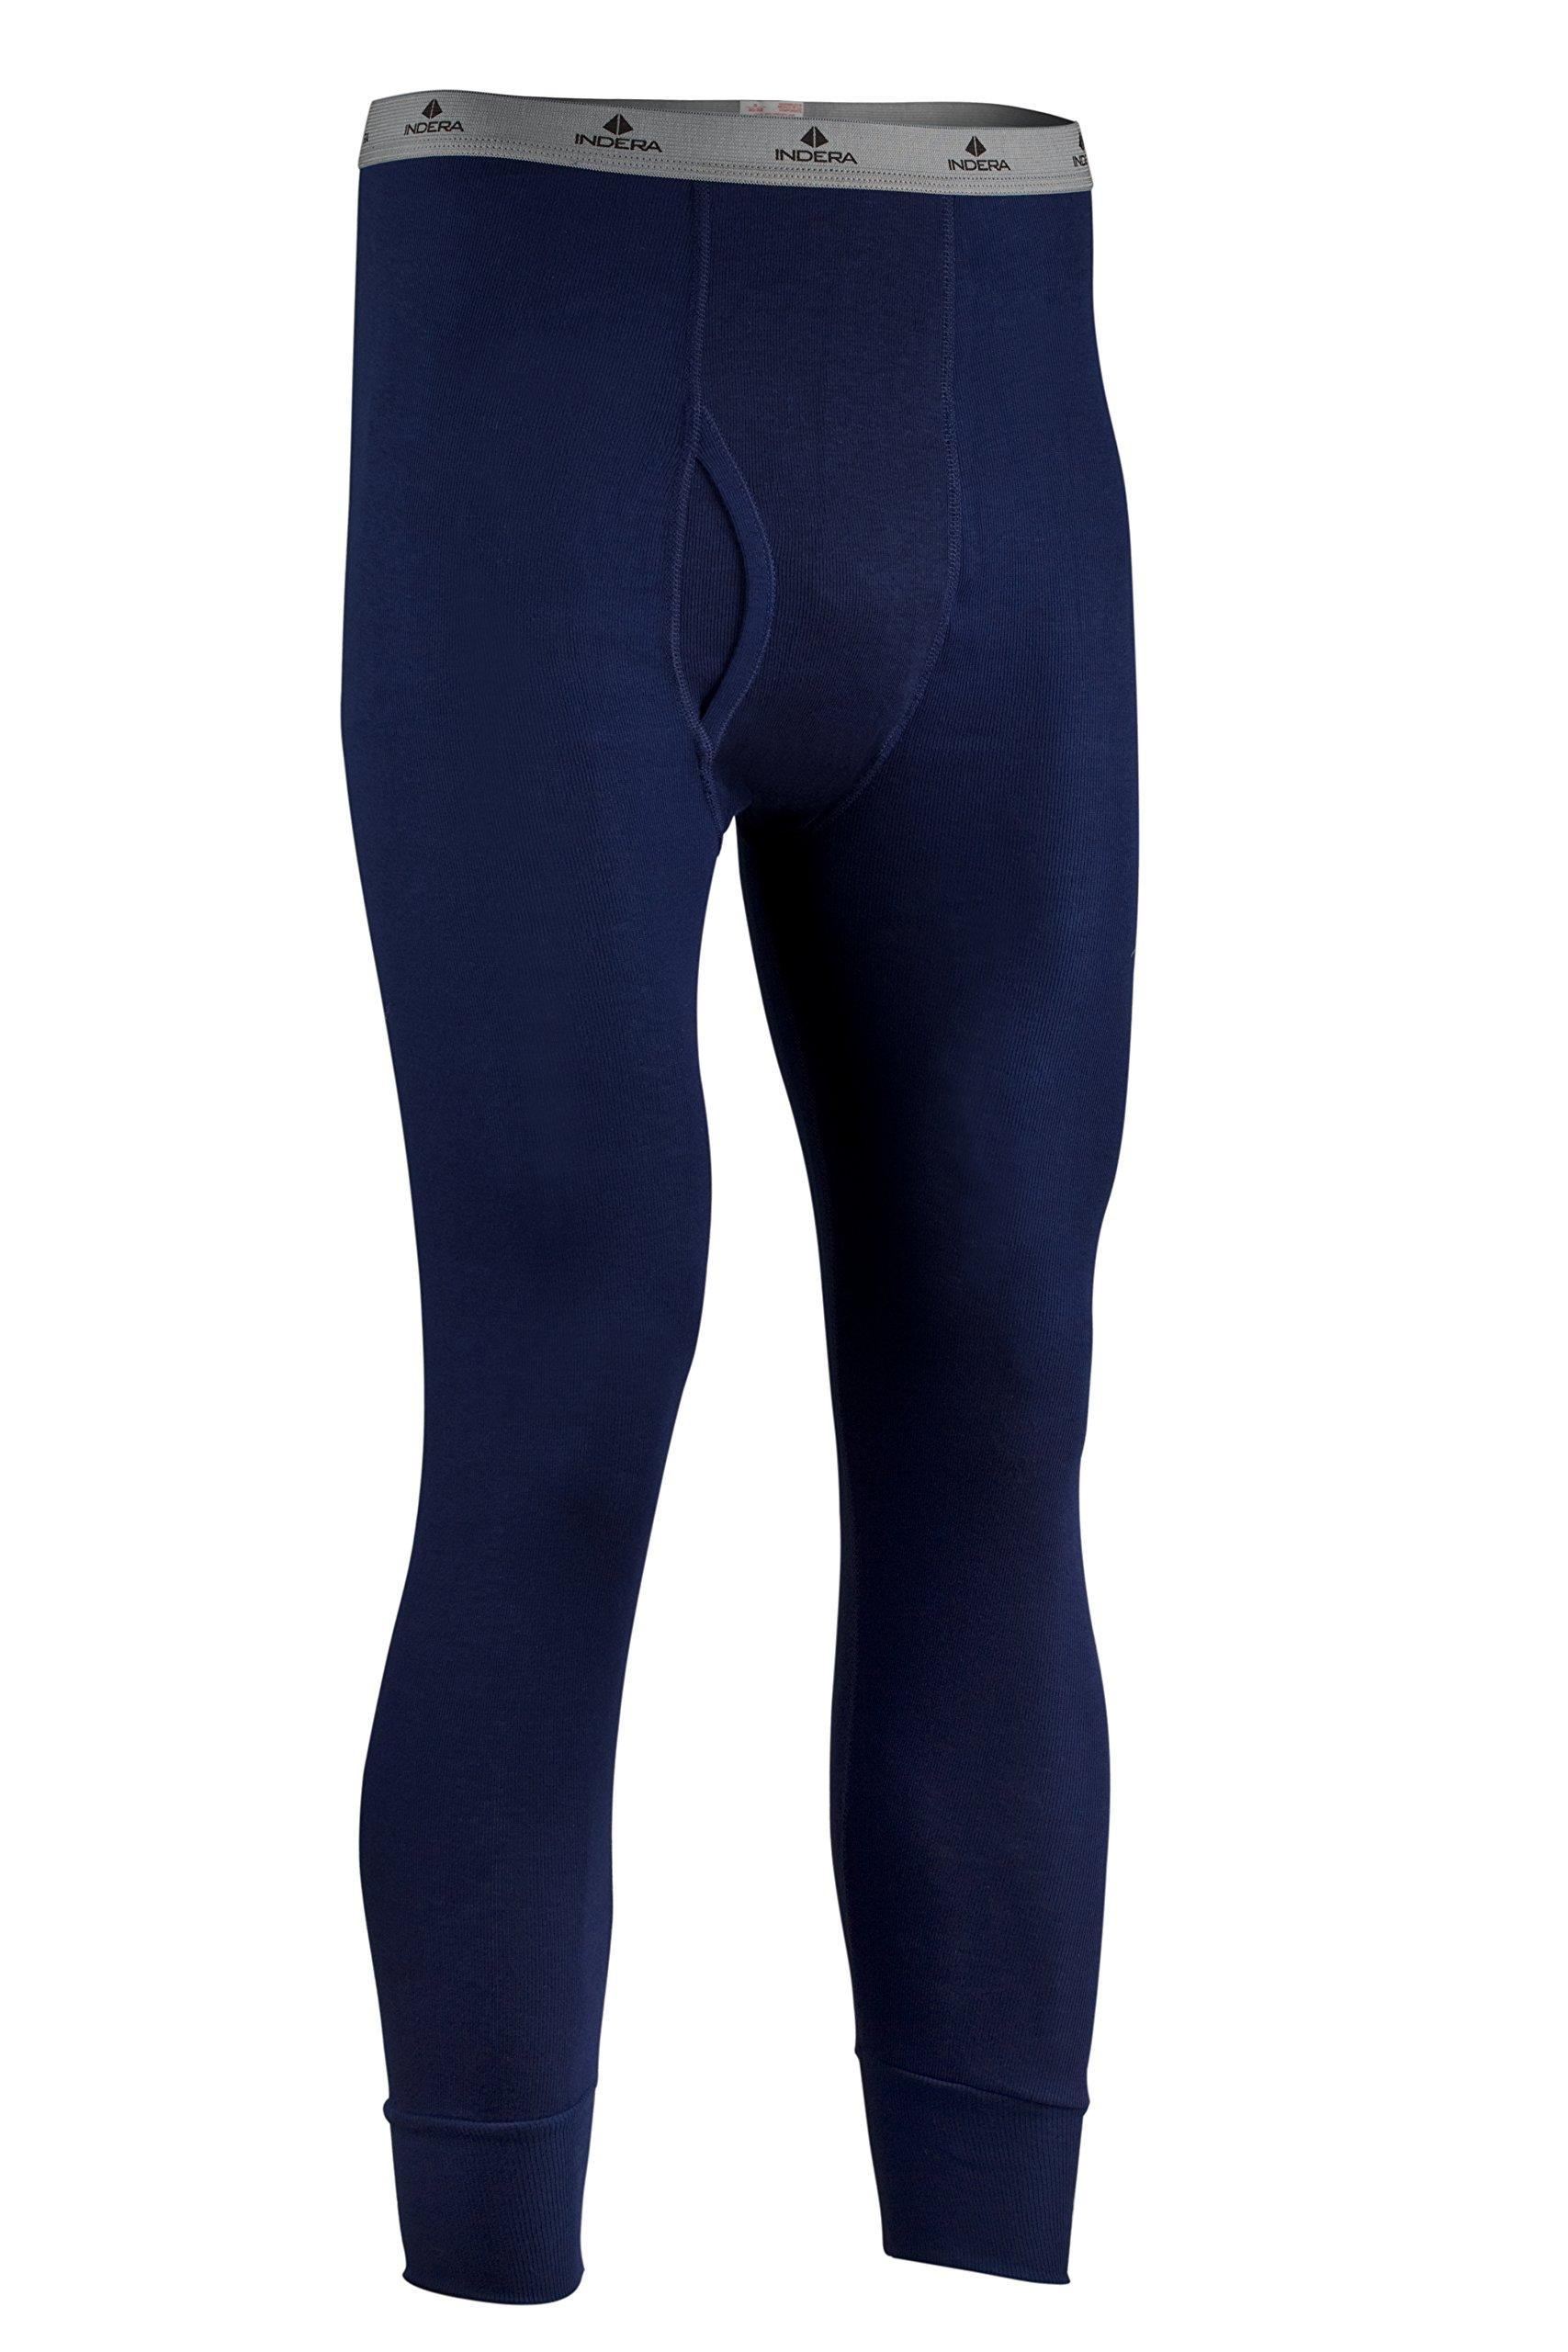 Indera Men's Tall Polypropylene Performance Rib Knit Thermal Underwear Pant, Navy, X-Large